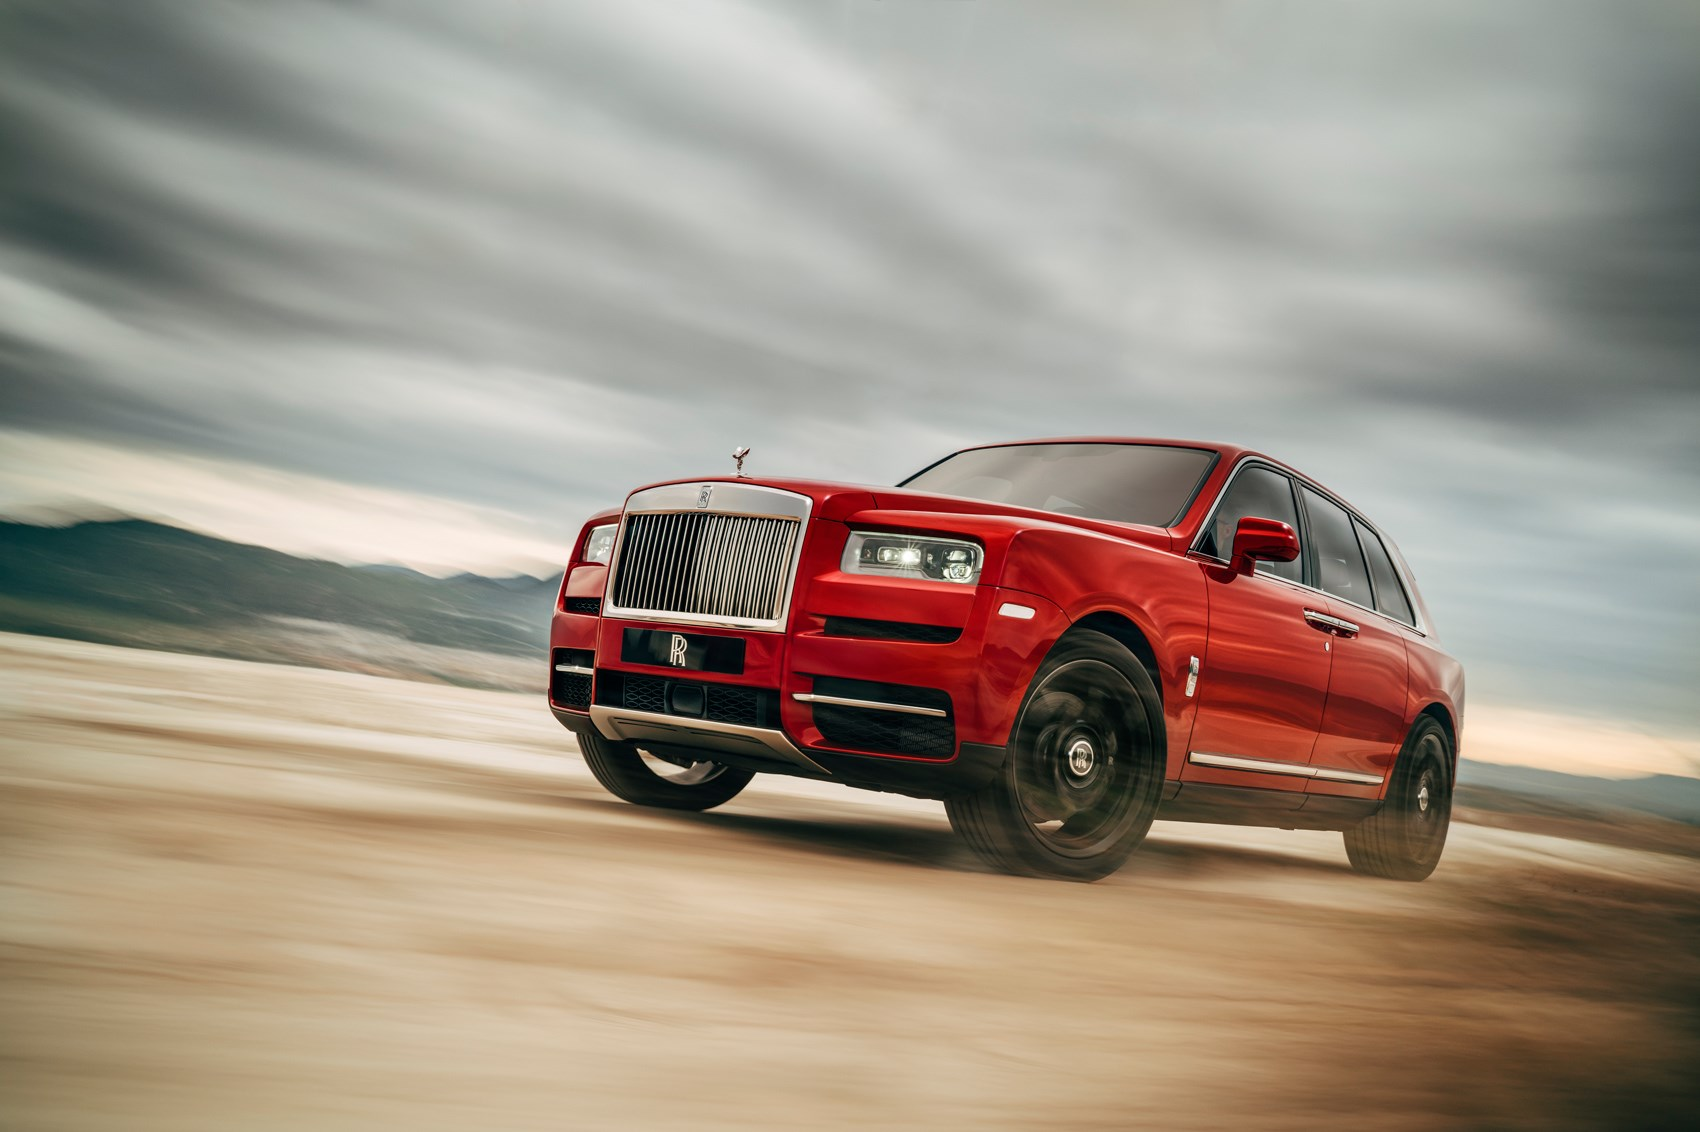 Cullinan Rolls Royce Interior >> New Rolls-Royce Cullinan SUV: Goodwood's diamond for the rough   CAR Magazine